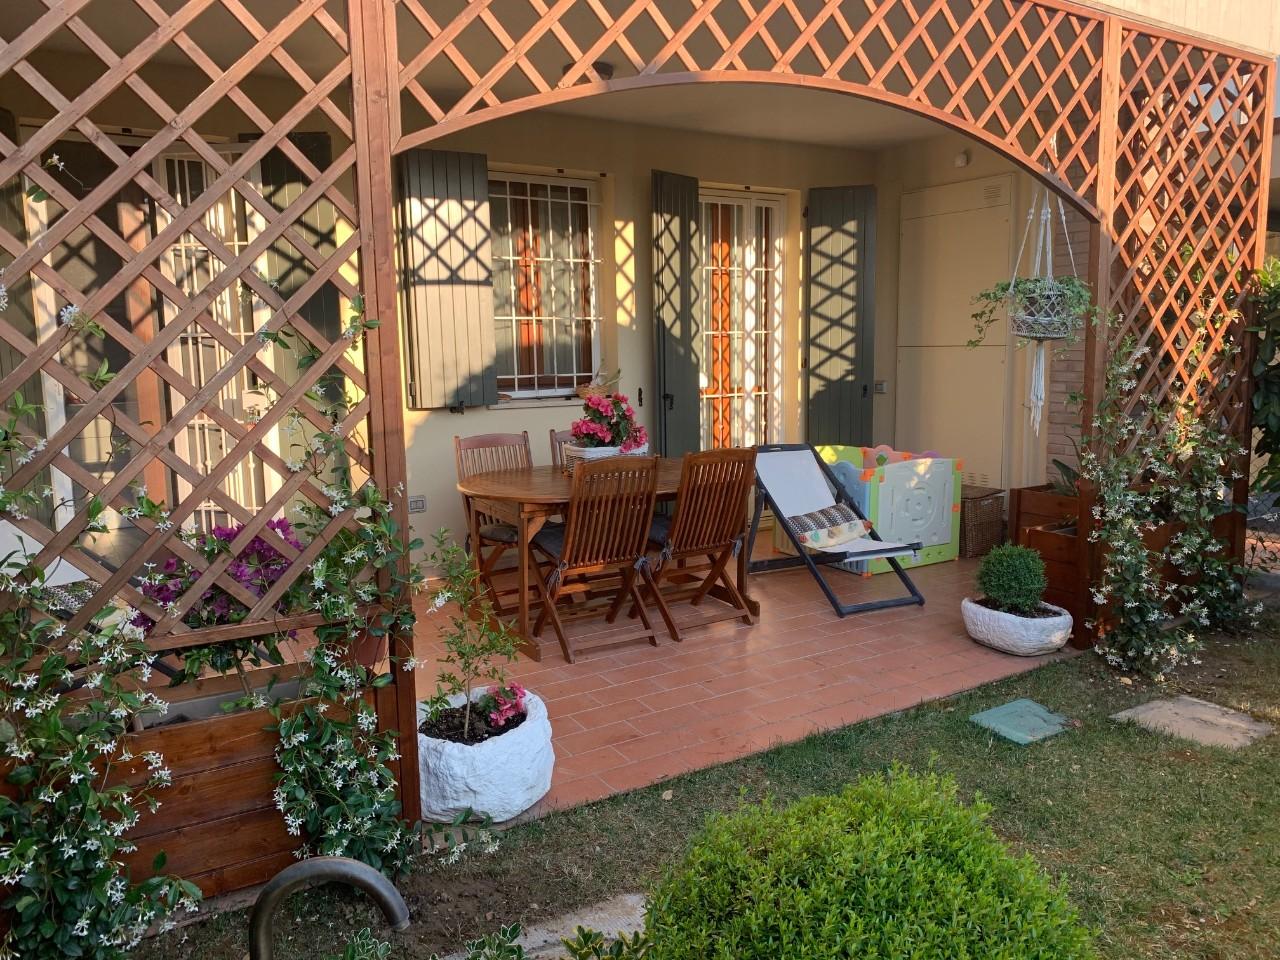 Appartamento in vendita Forli Zona San Martino in Strada